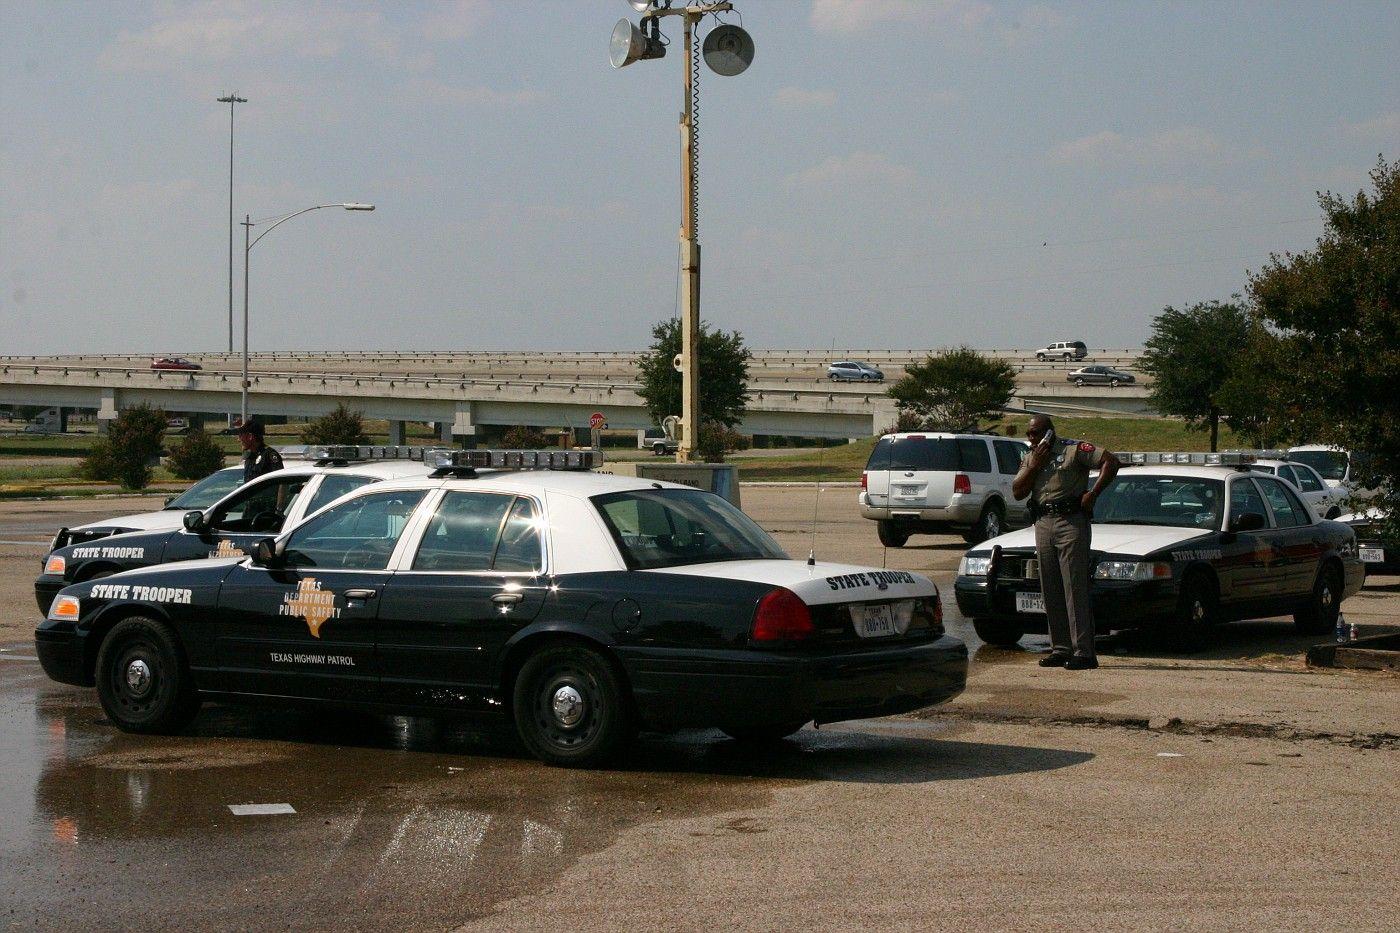 Pin on Texas State Patrol, Texas Game Wardens.